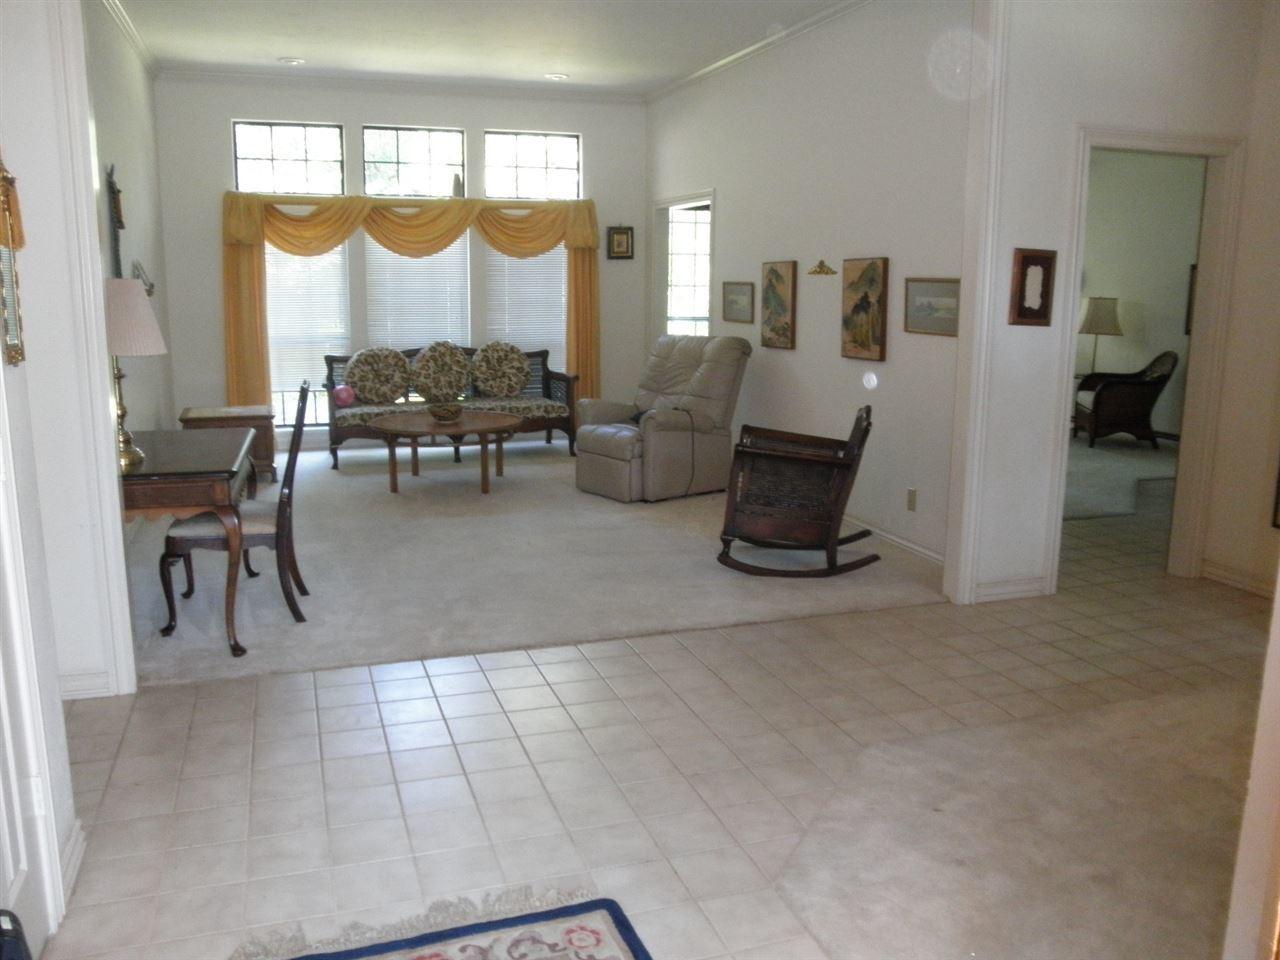 Sold Intraoffice W/MLS | 2 Woodcrest  Ponca City, OK 74604 7